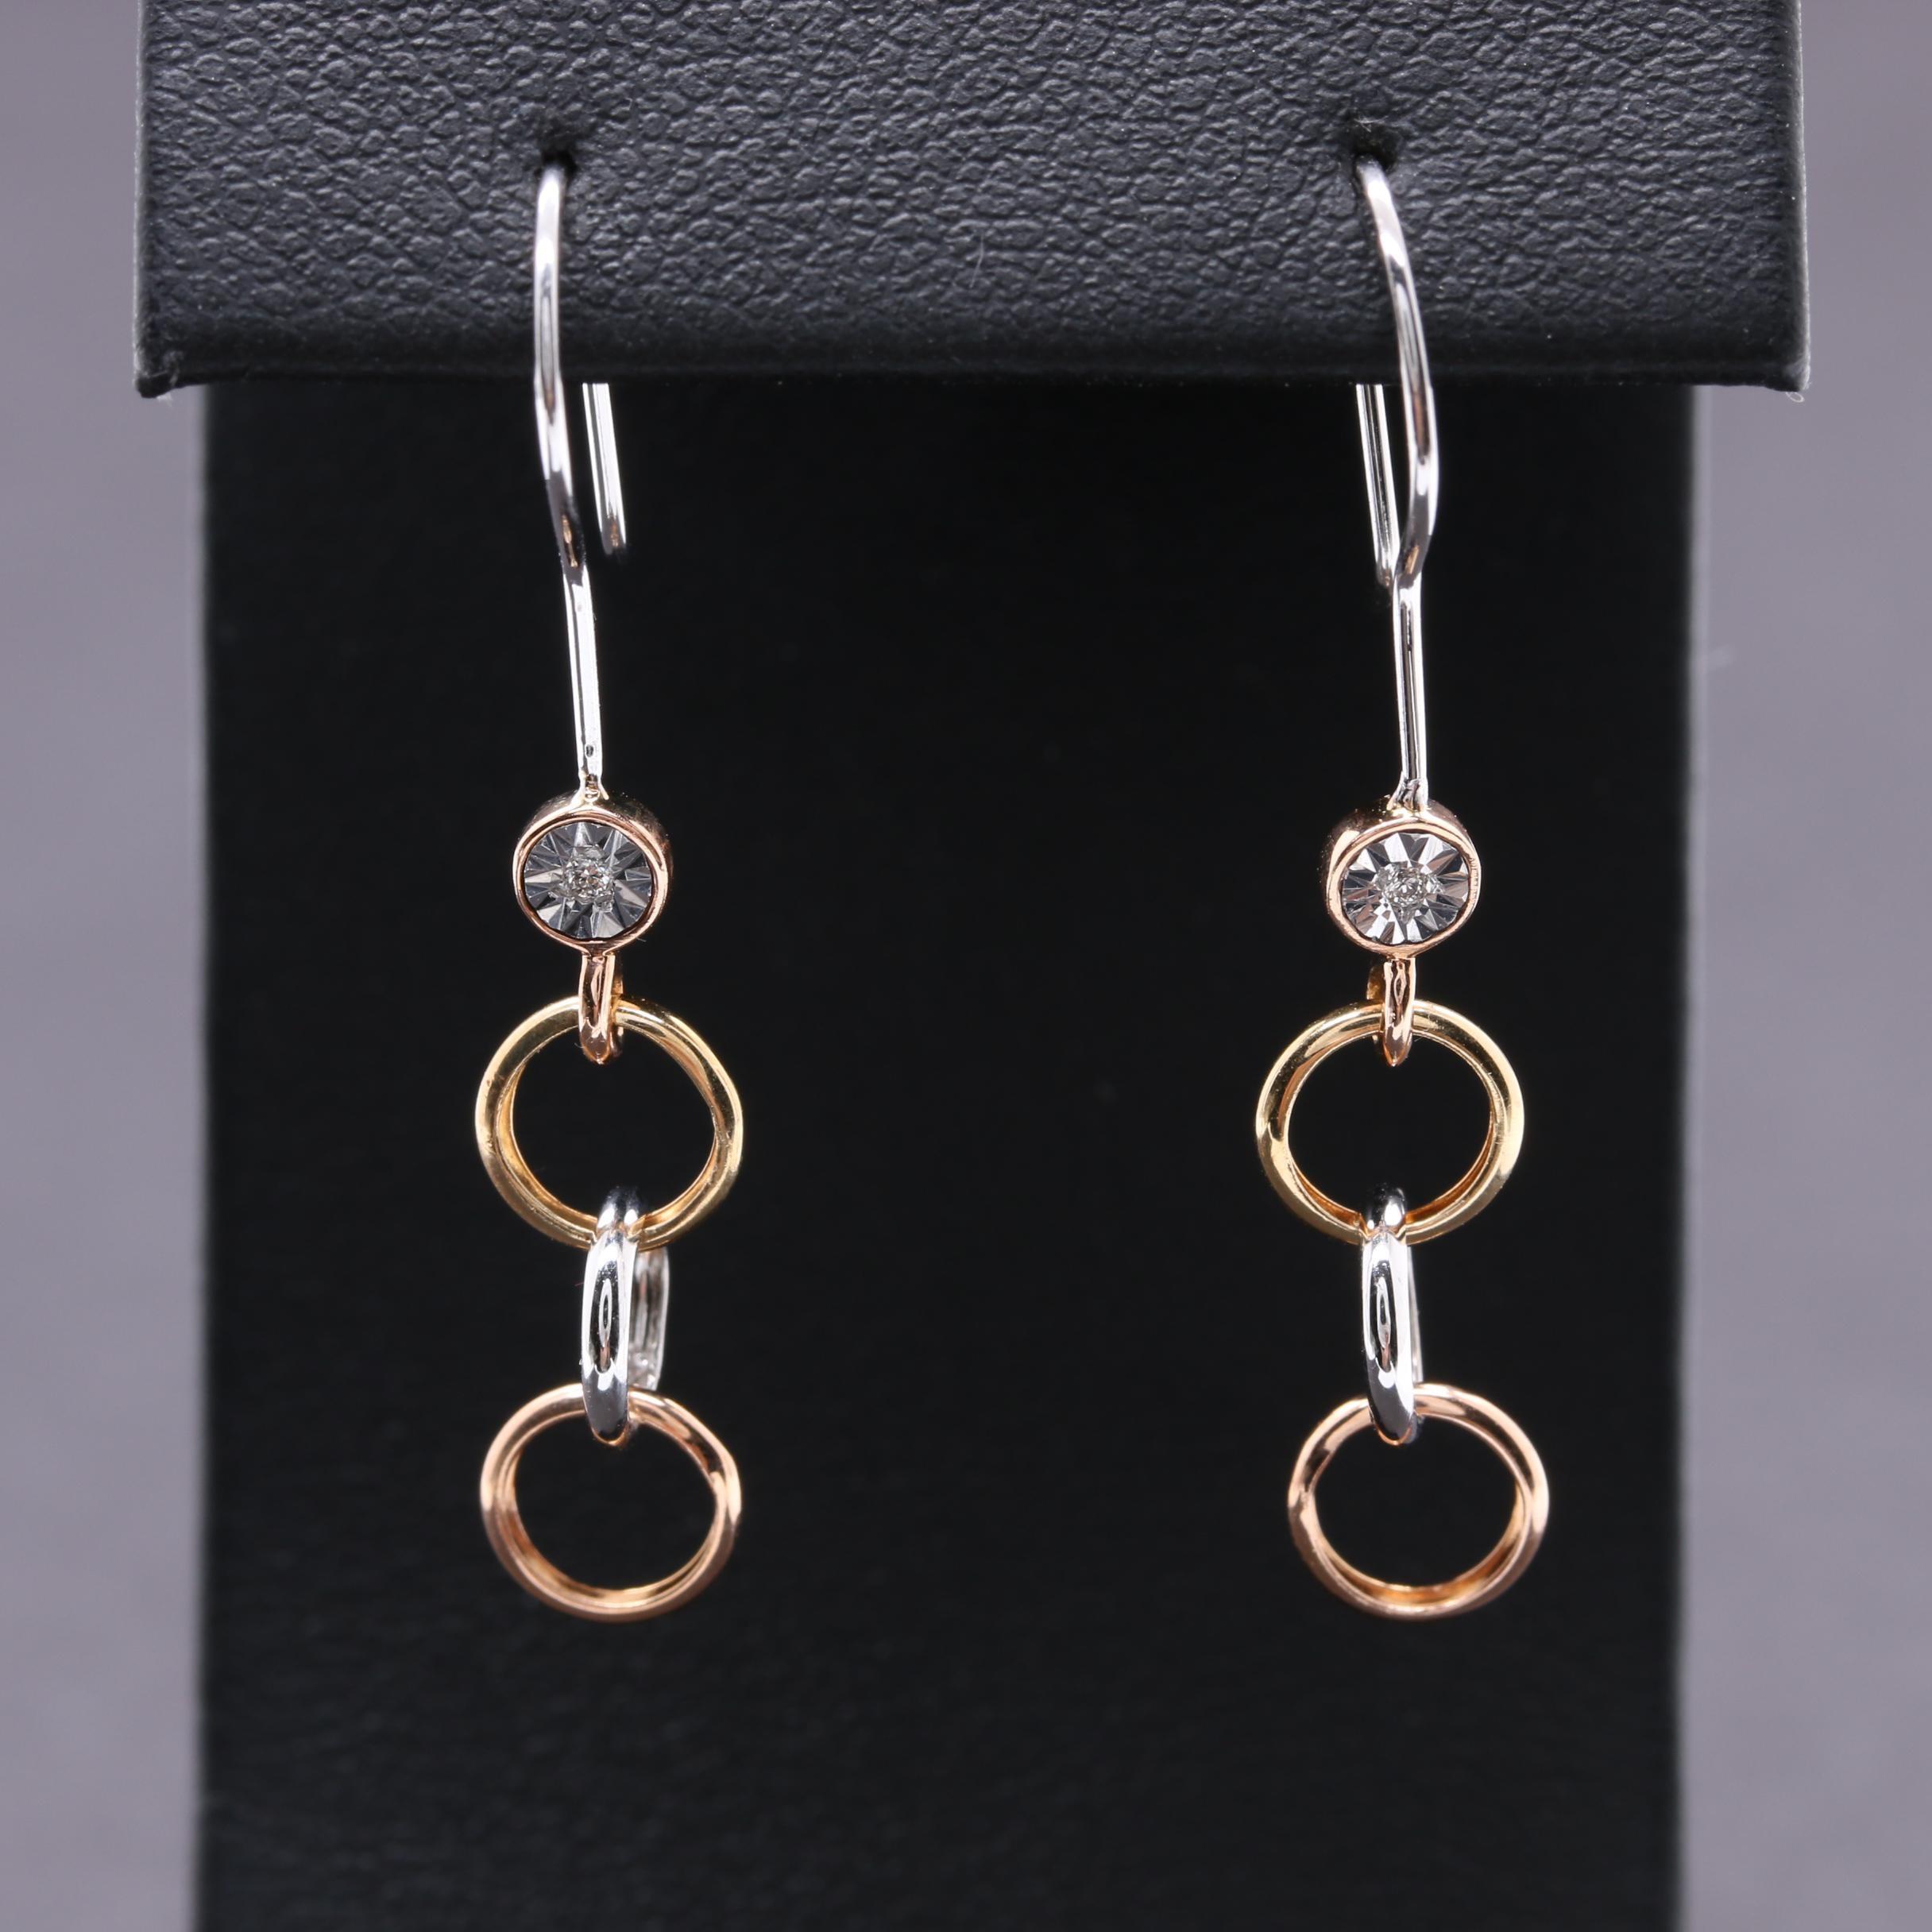 14K Tri-Tone Gold Diamond Earrings